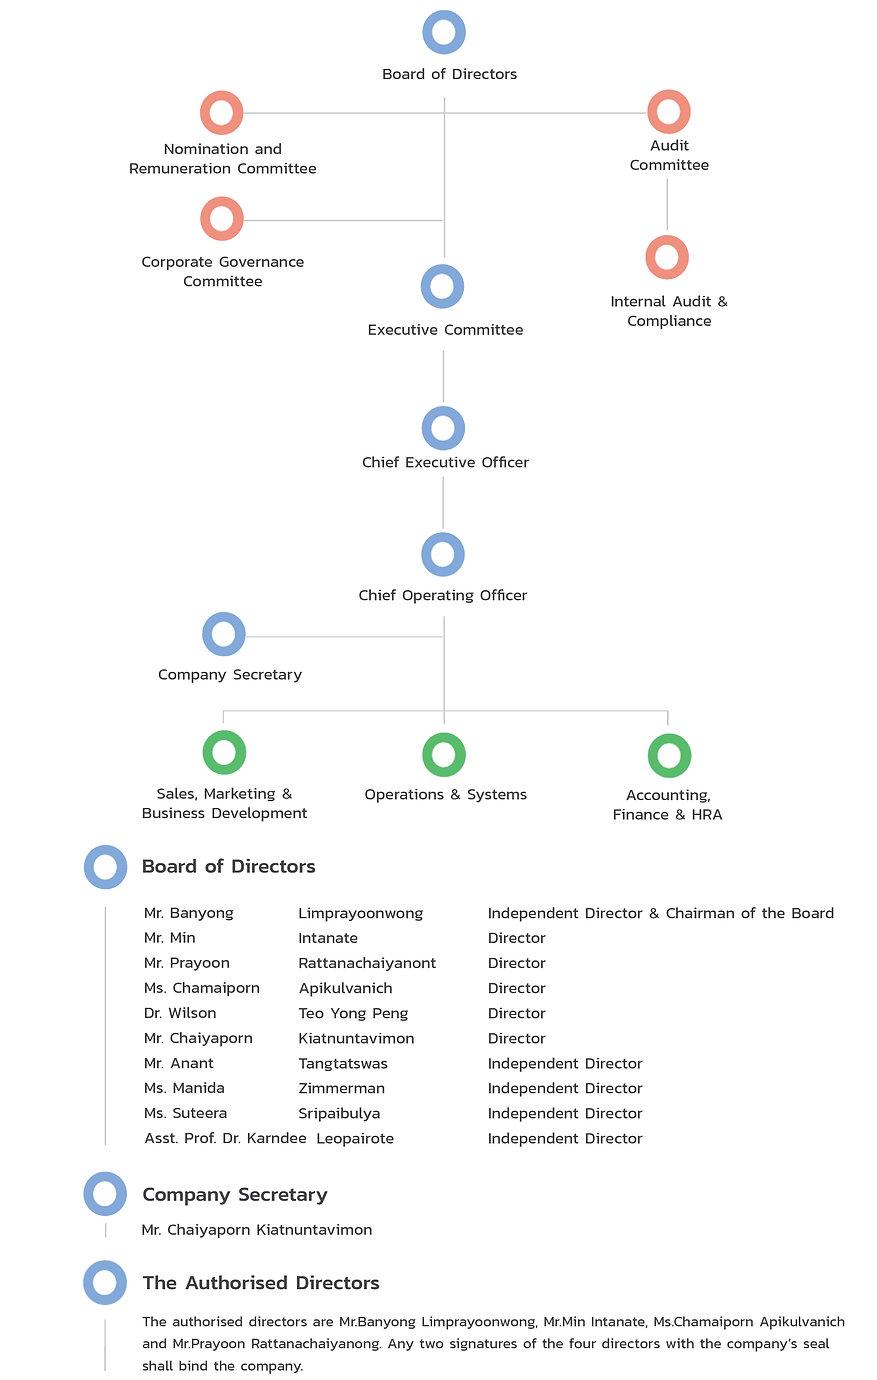 corporatestructure 01.jpg